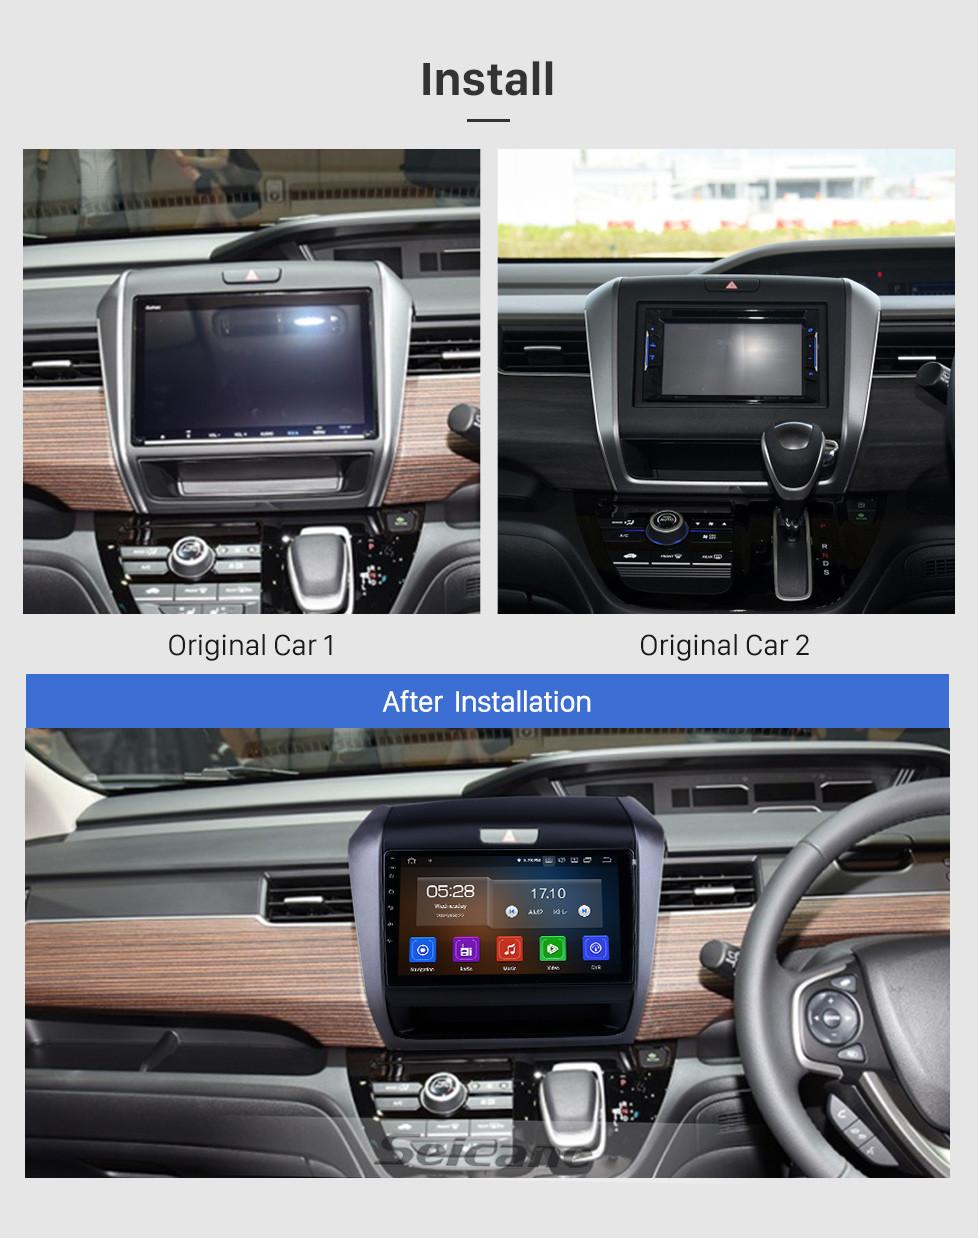 Seicane 9 inch For 2020 Honda Freed Hybrid RHD Radio Android 10.0 GPS Navigation System Bluetooth HD Touchscreen Carplay support Digital TV